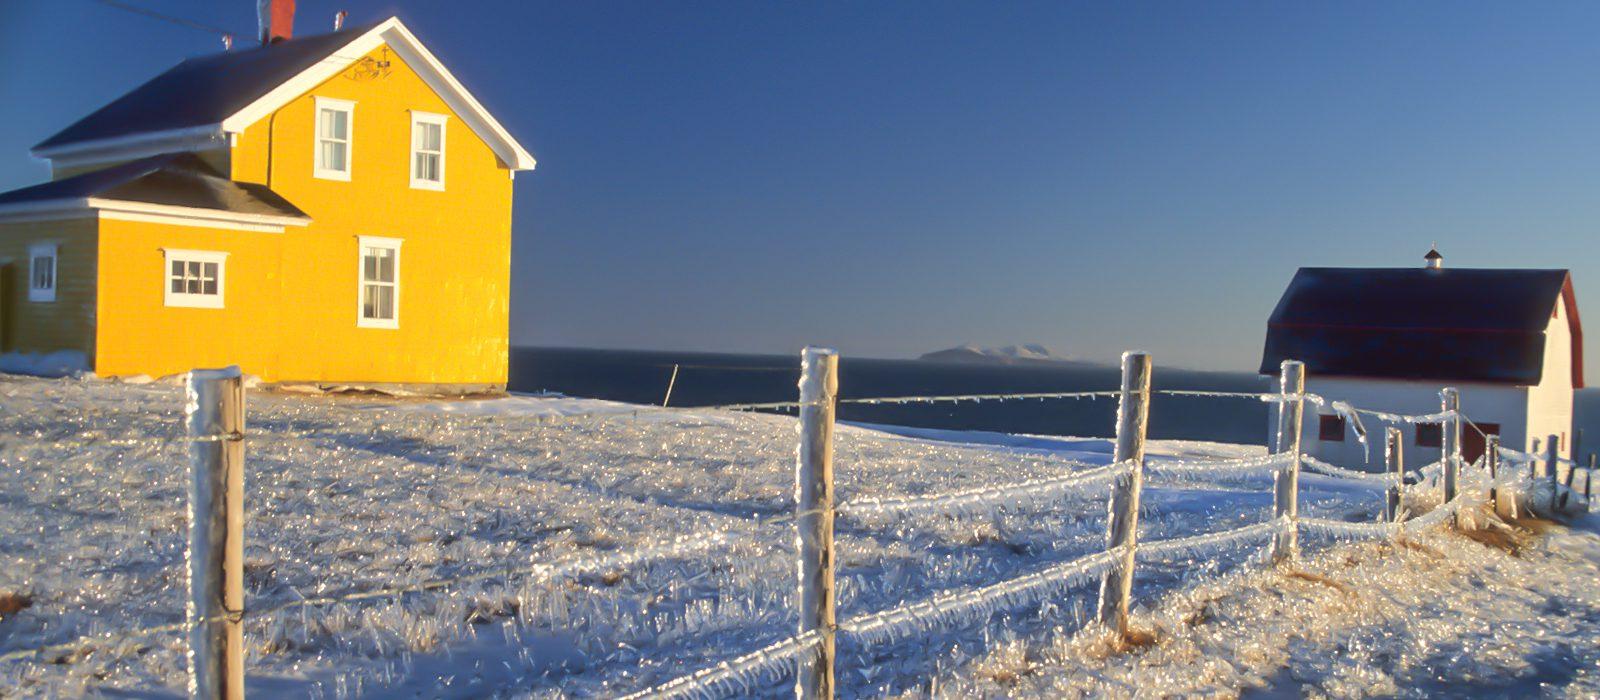 un-hiver-actif-au-quebec-iles-de-la-madeleine-bebe-phoque-quebec-le-mag